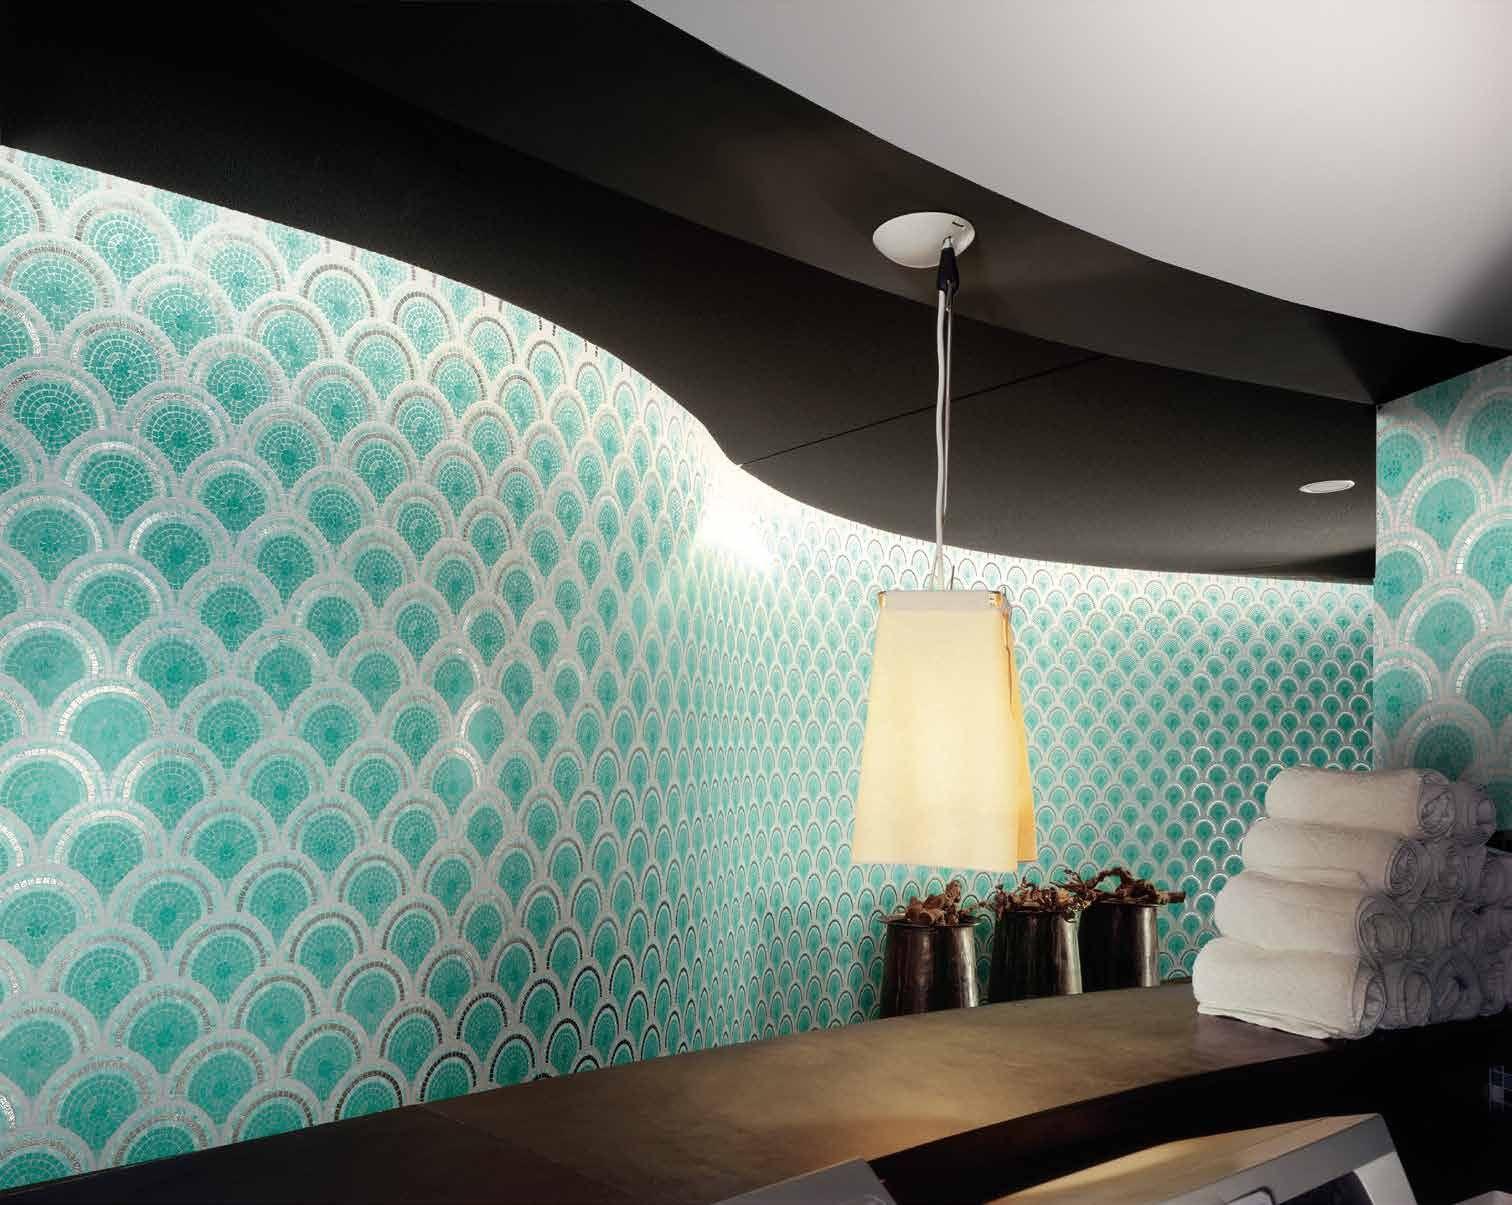 Bisazza #decori in #tecnica artistica 10x10 loop green #gres su